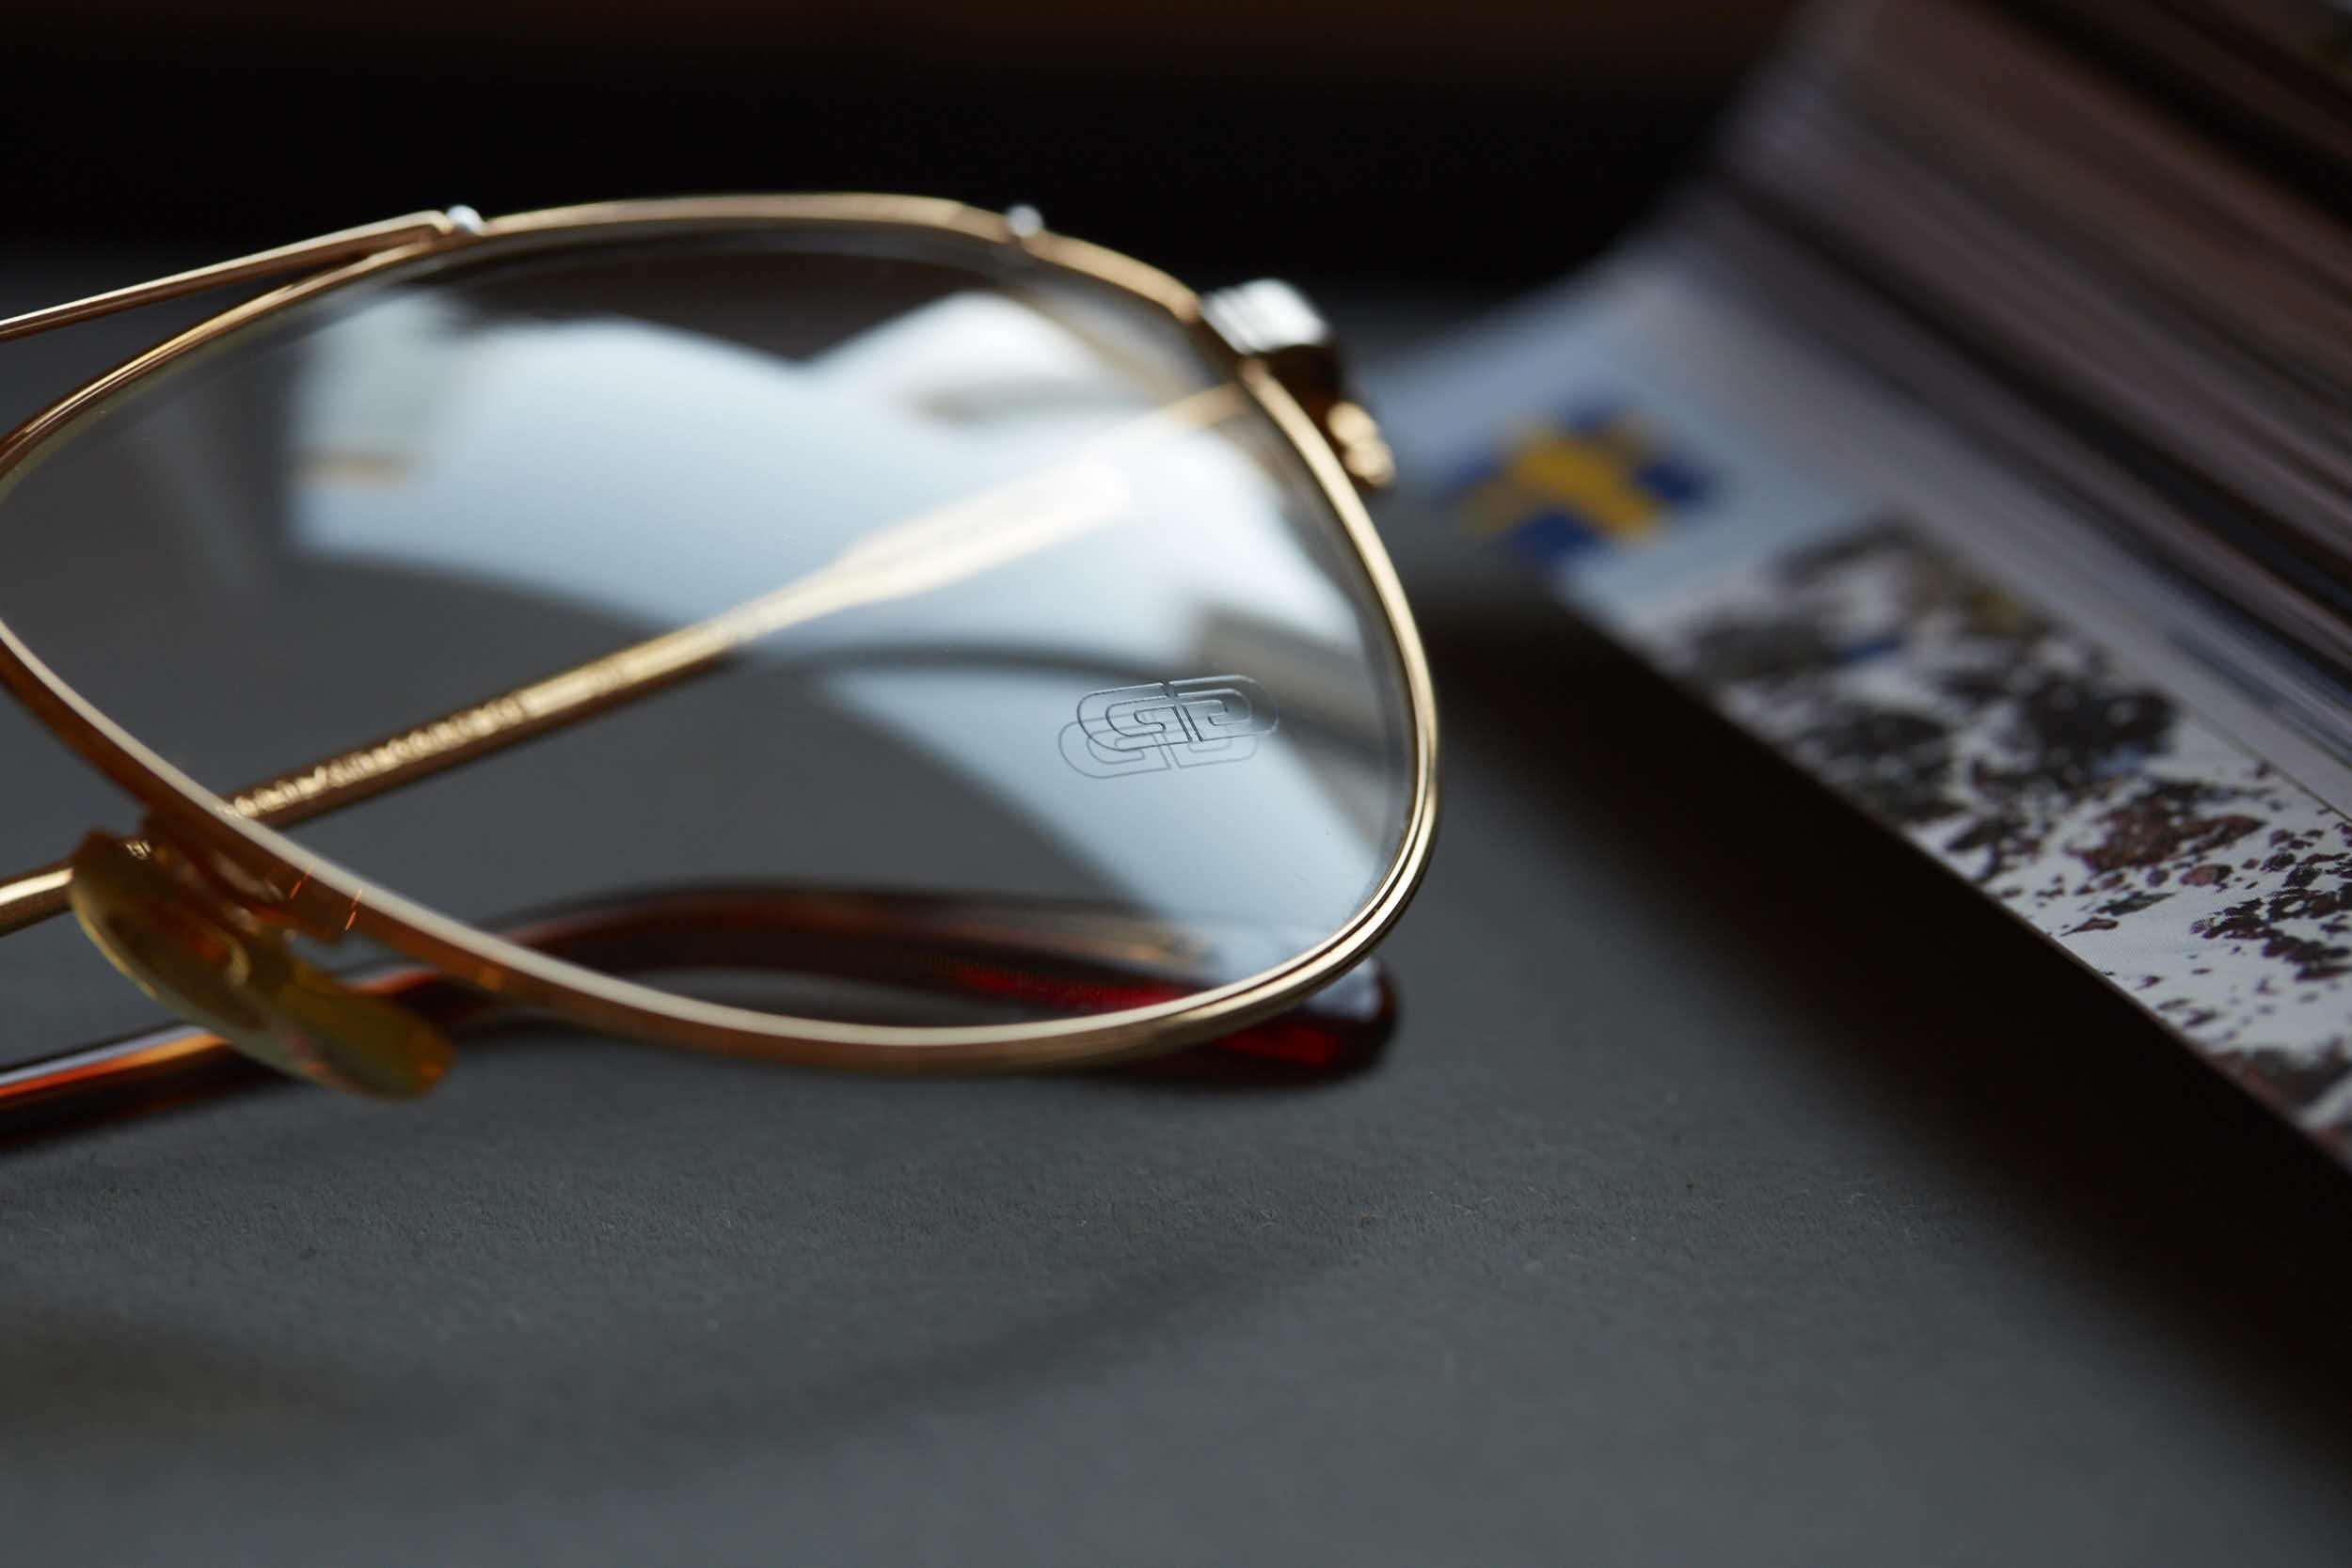 Gerald_Genta_Sun-ye_Glasses_NOS_1_site.jpg